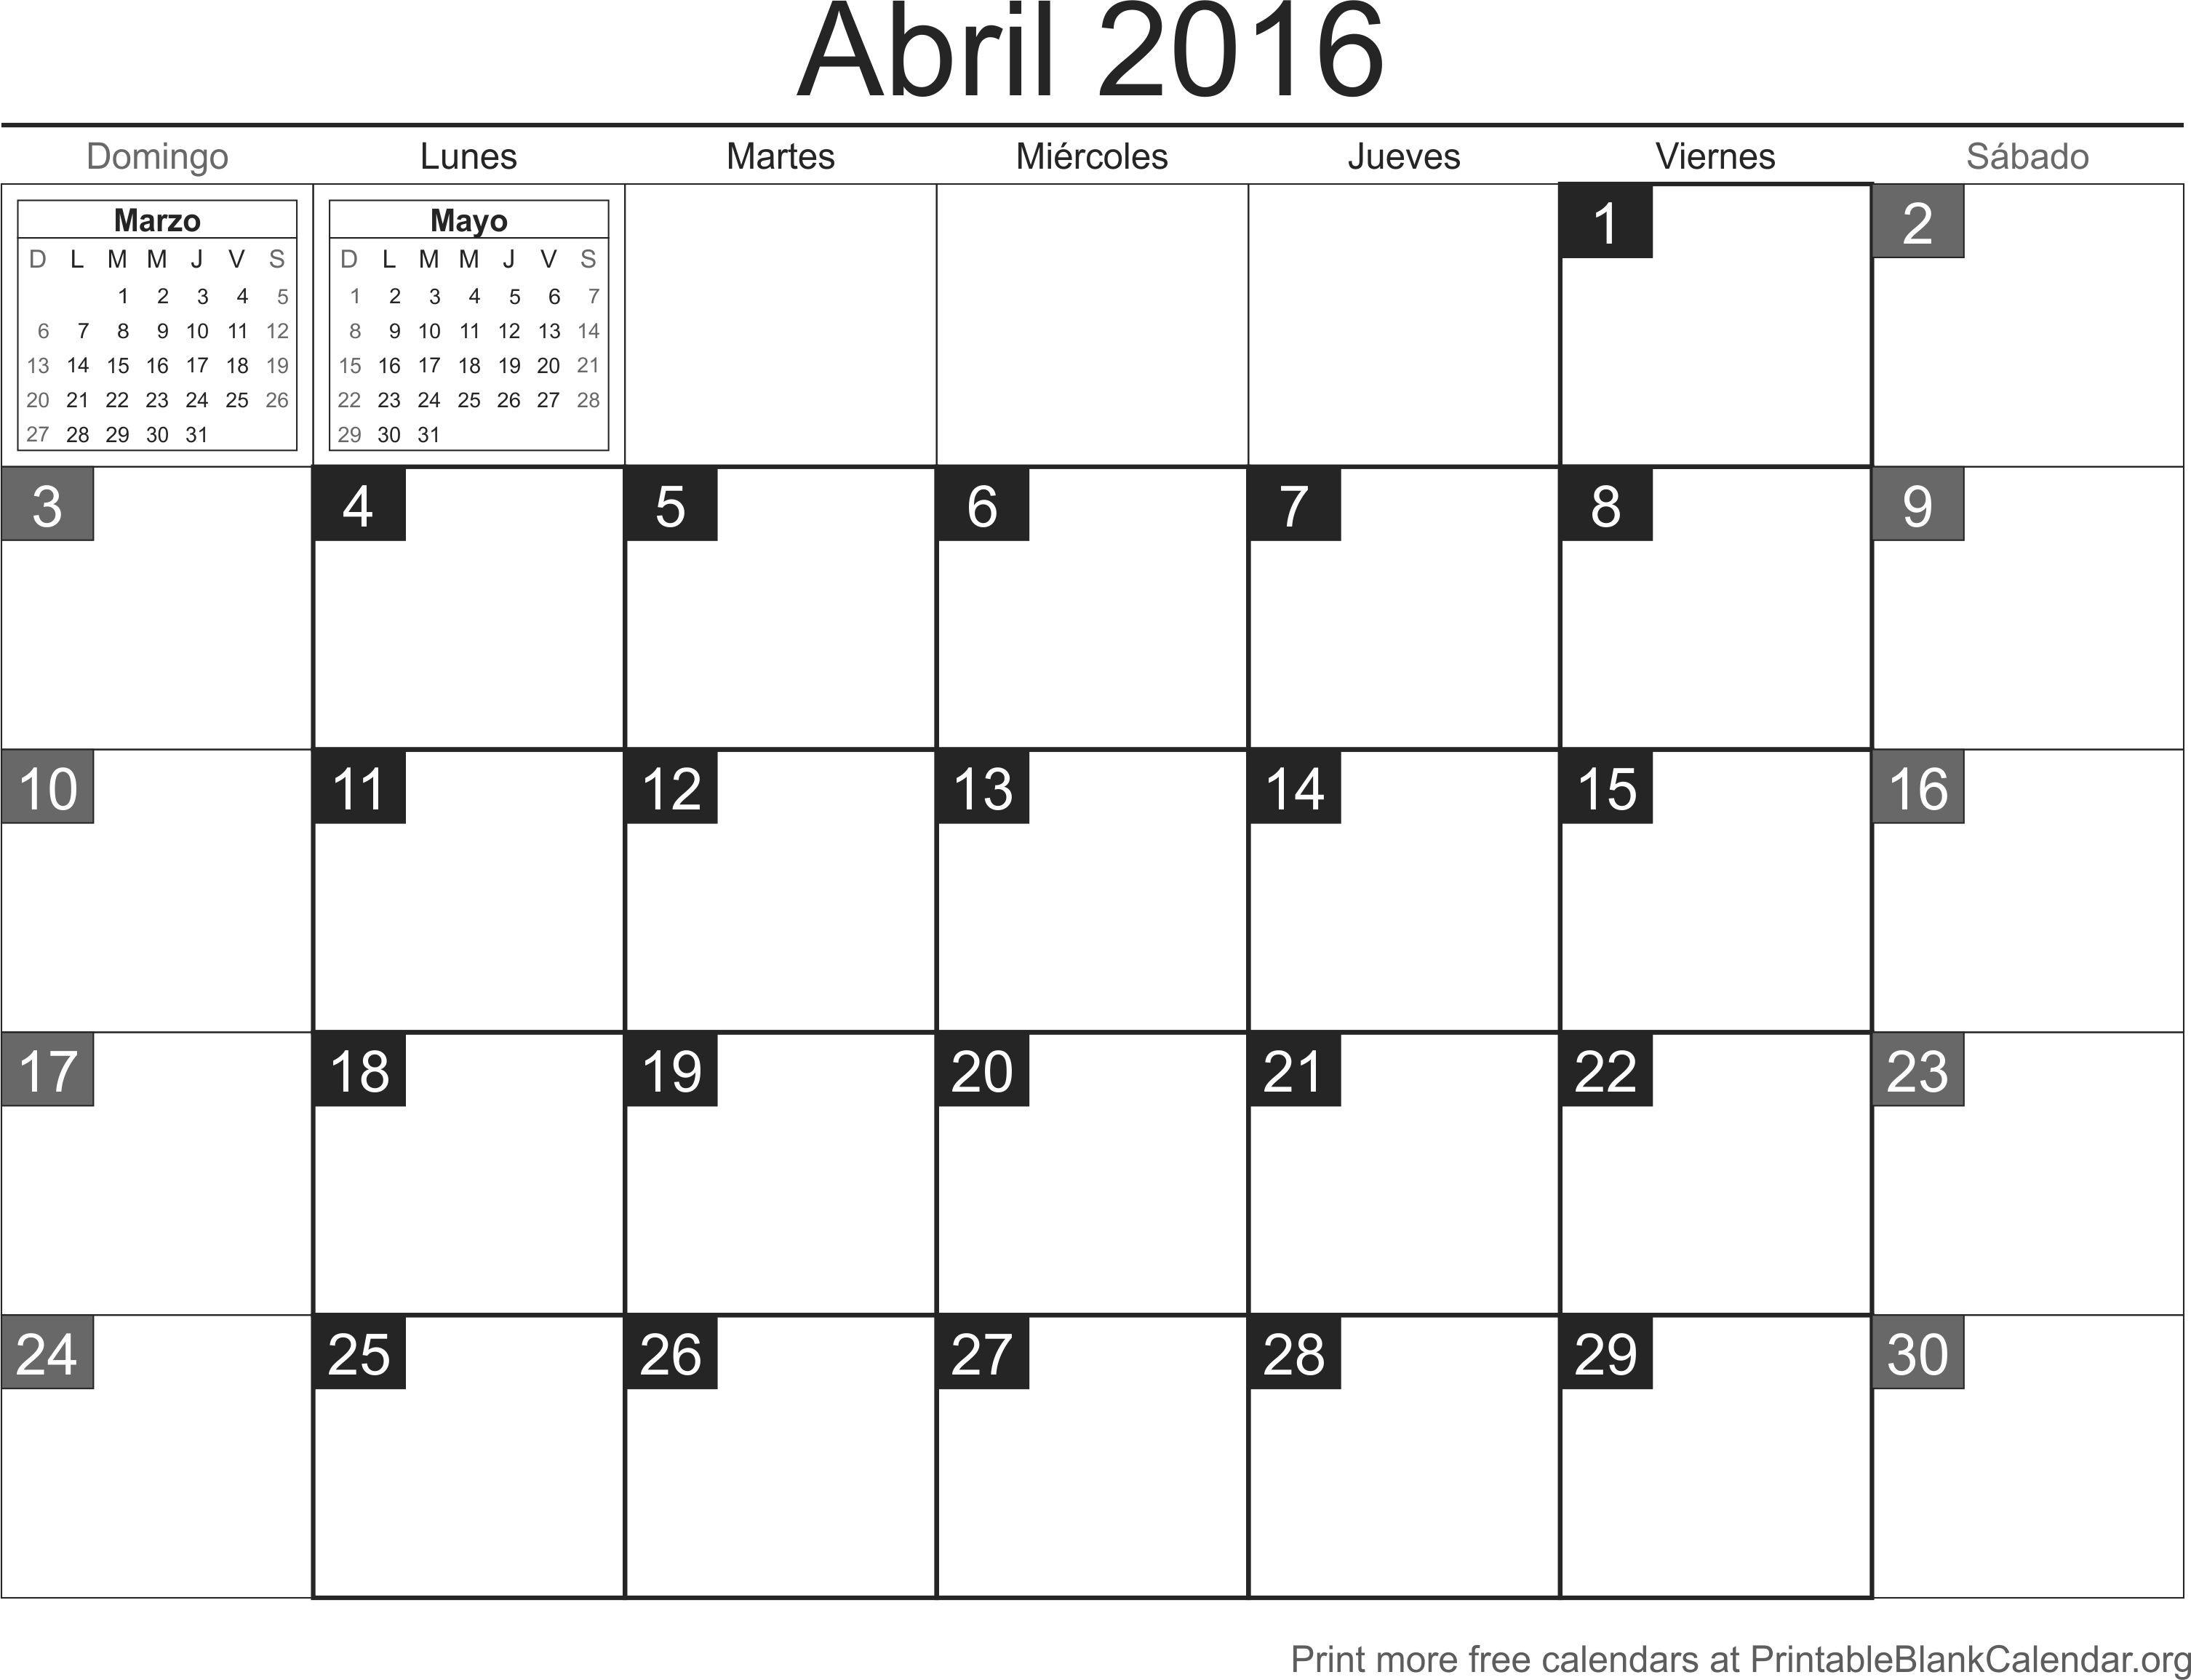 calendario para imprimir abril 2016